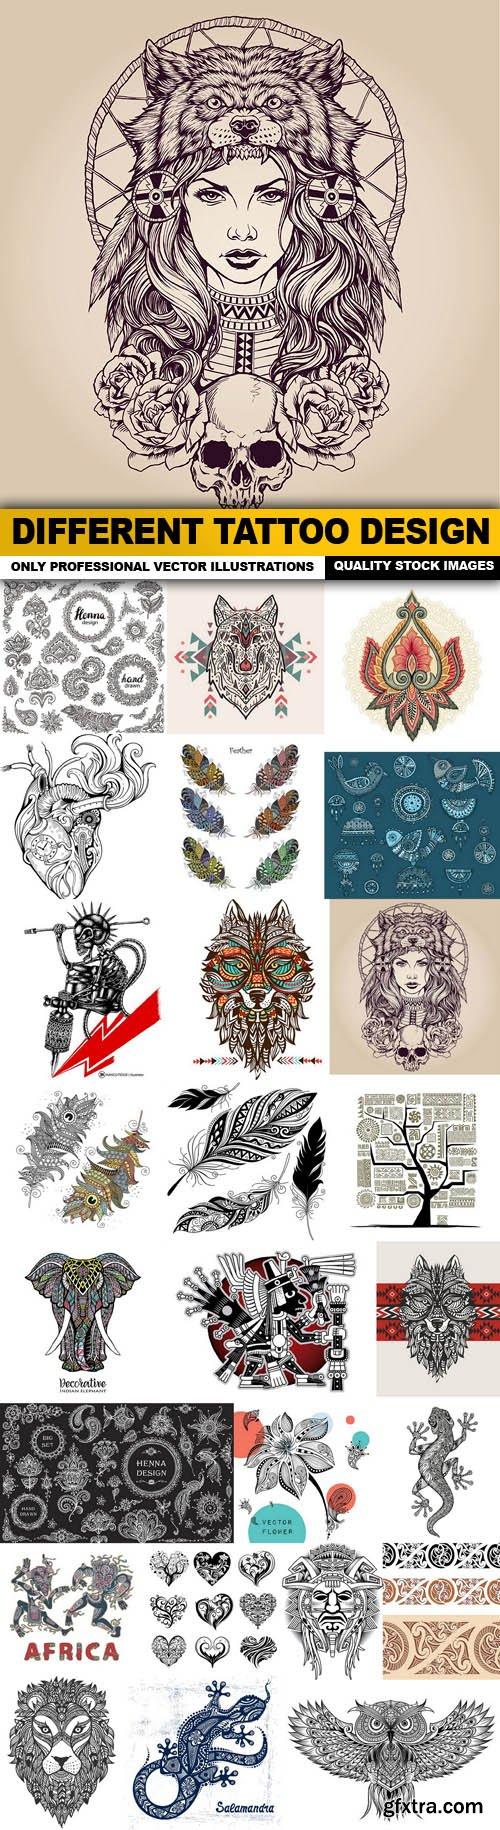 Different Tattoo Design - 25 Vector